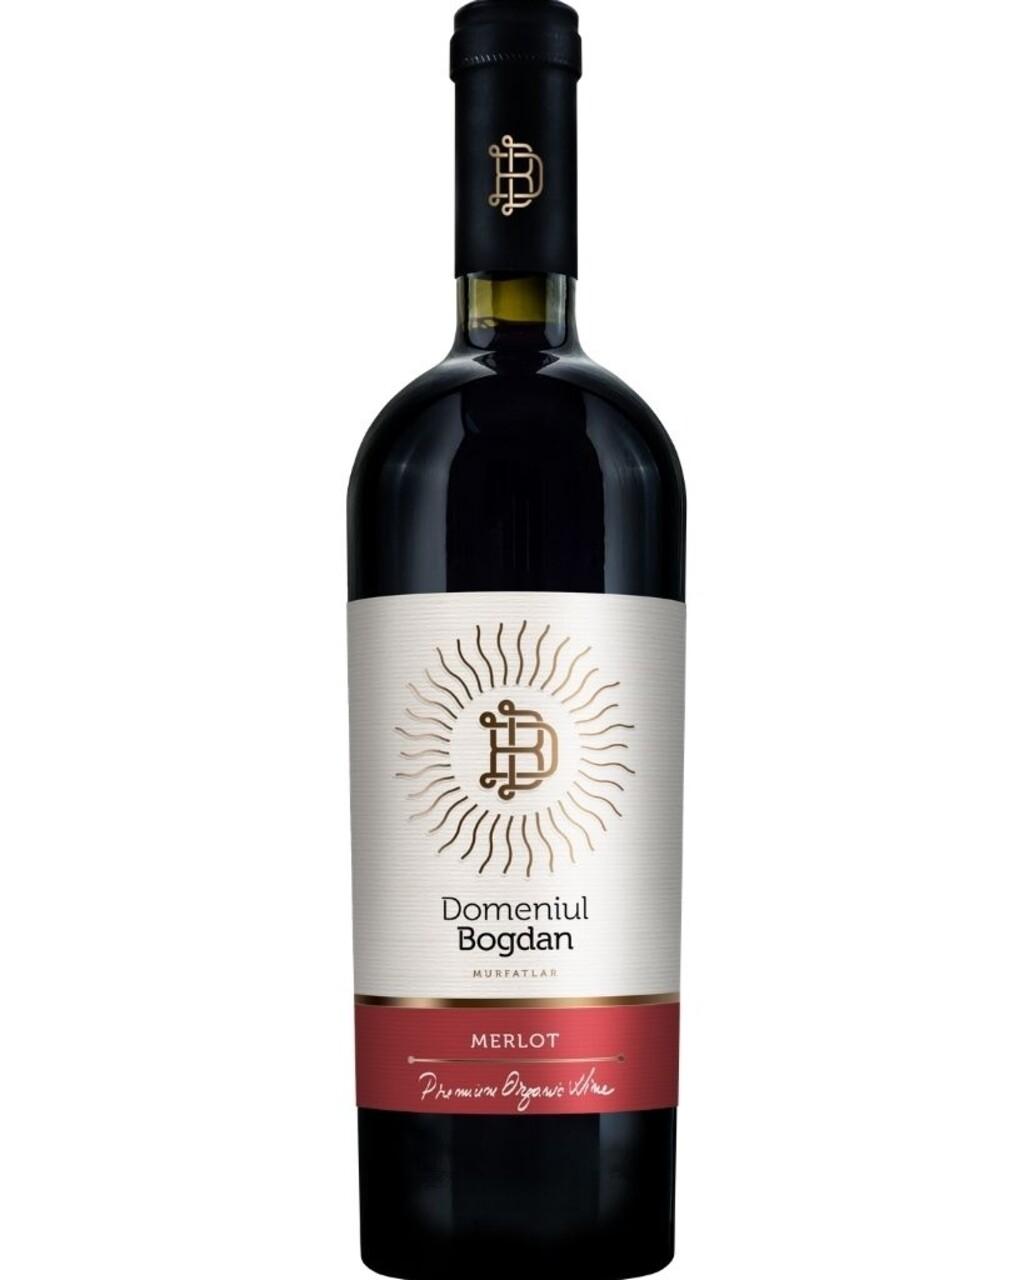 Domeniul Bogdan Premium Merlot